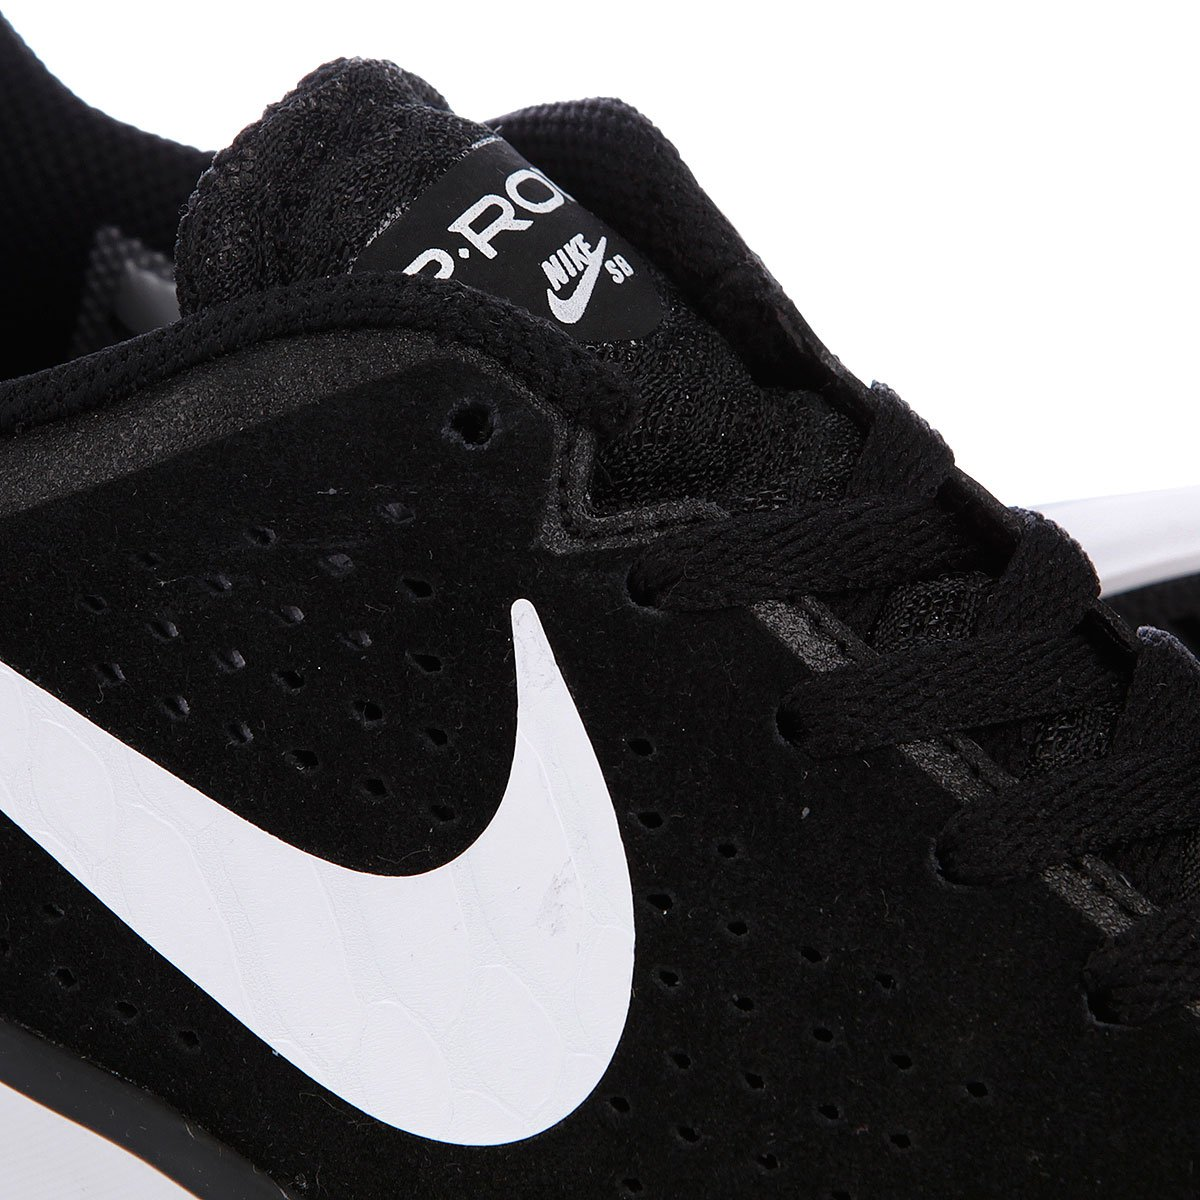 8481f087 Купить кеды Nike Sb Paul Rodriguez Ctd Lr Black/White (677245-001) в ...